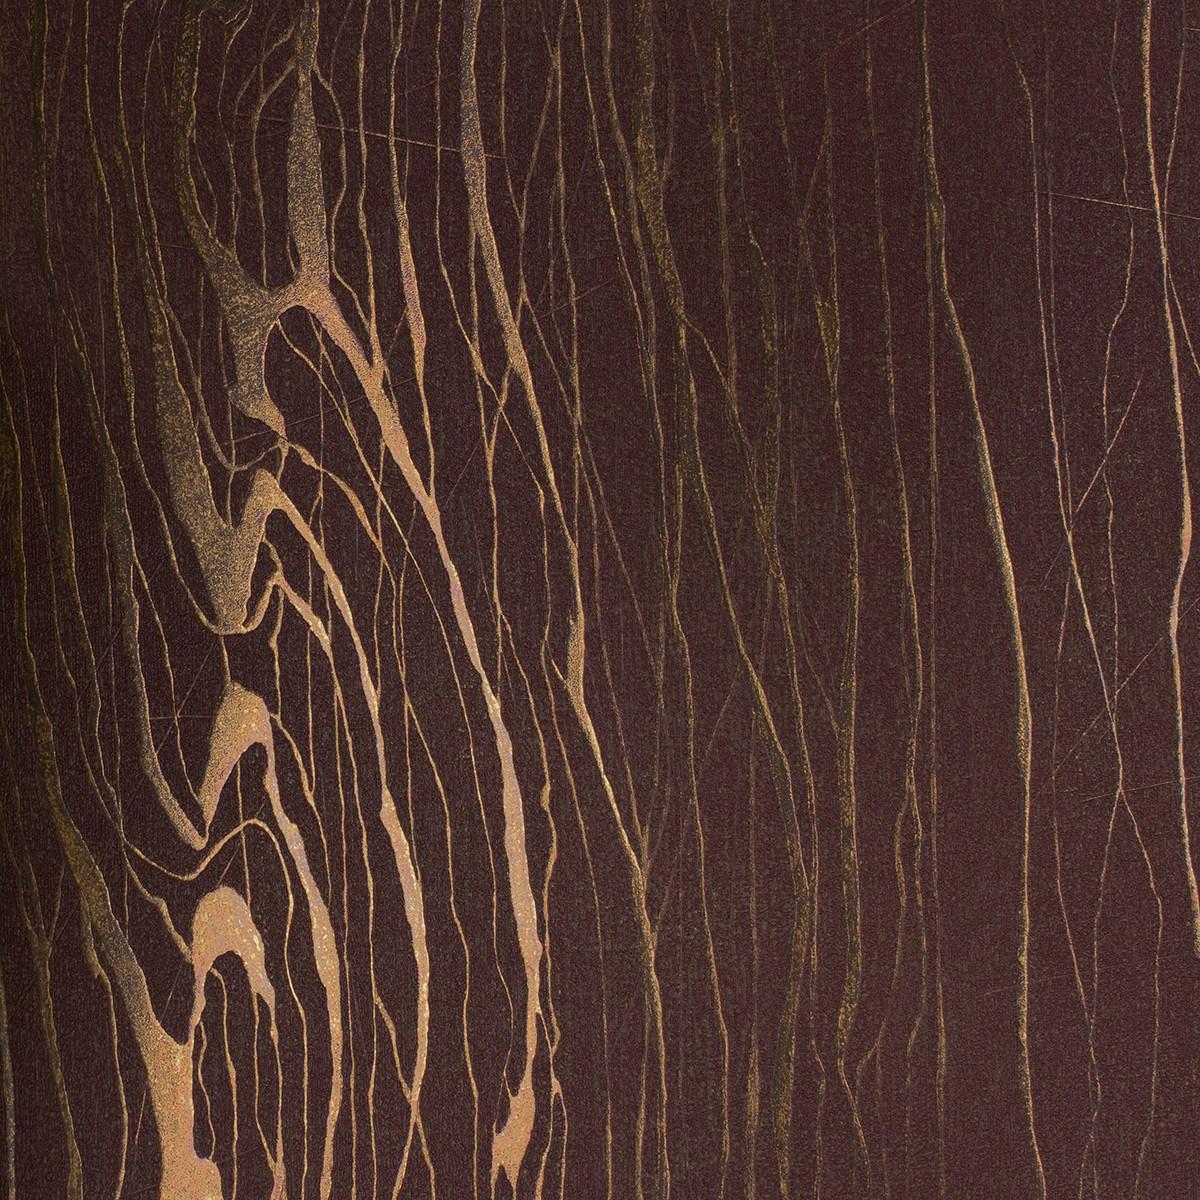 vliestapete luigi colani struktur braun gold 53333. Black Bedroom Furniture Sets. Home Design Ideas